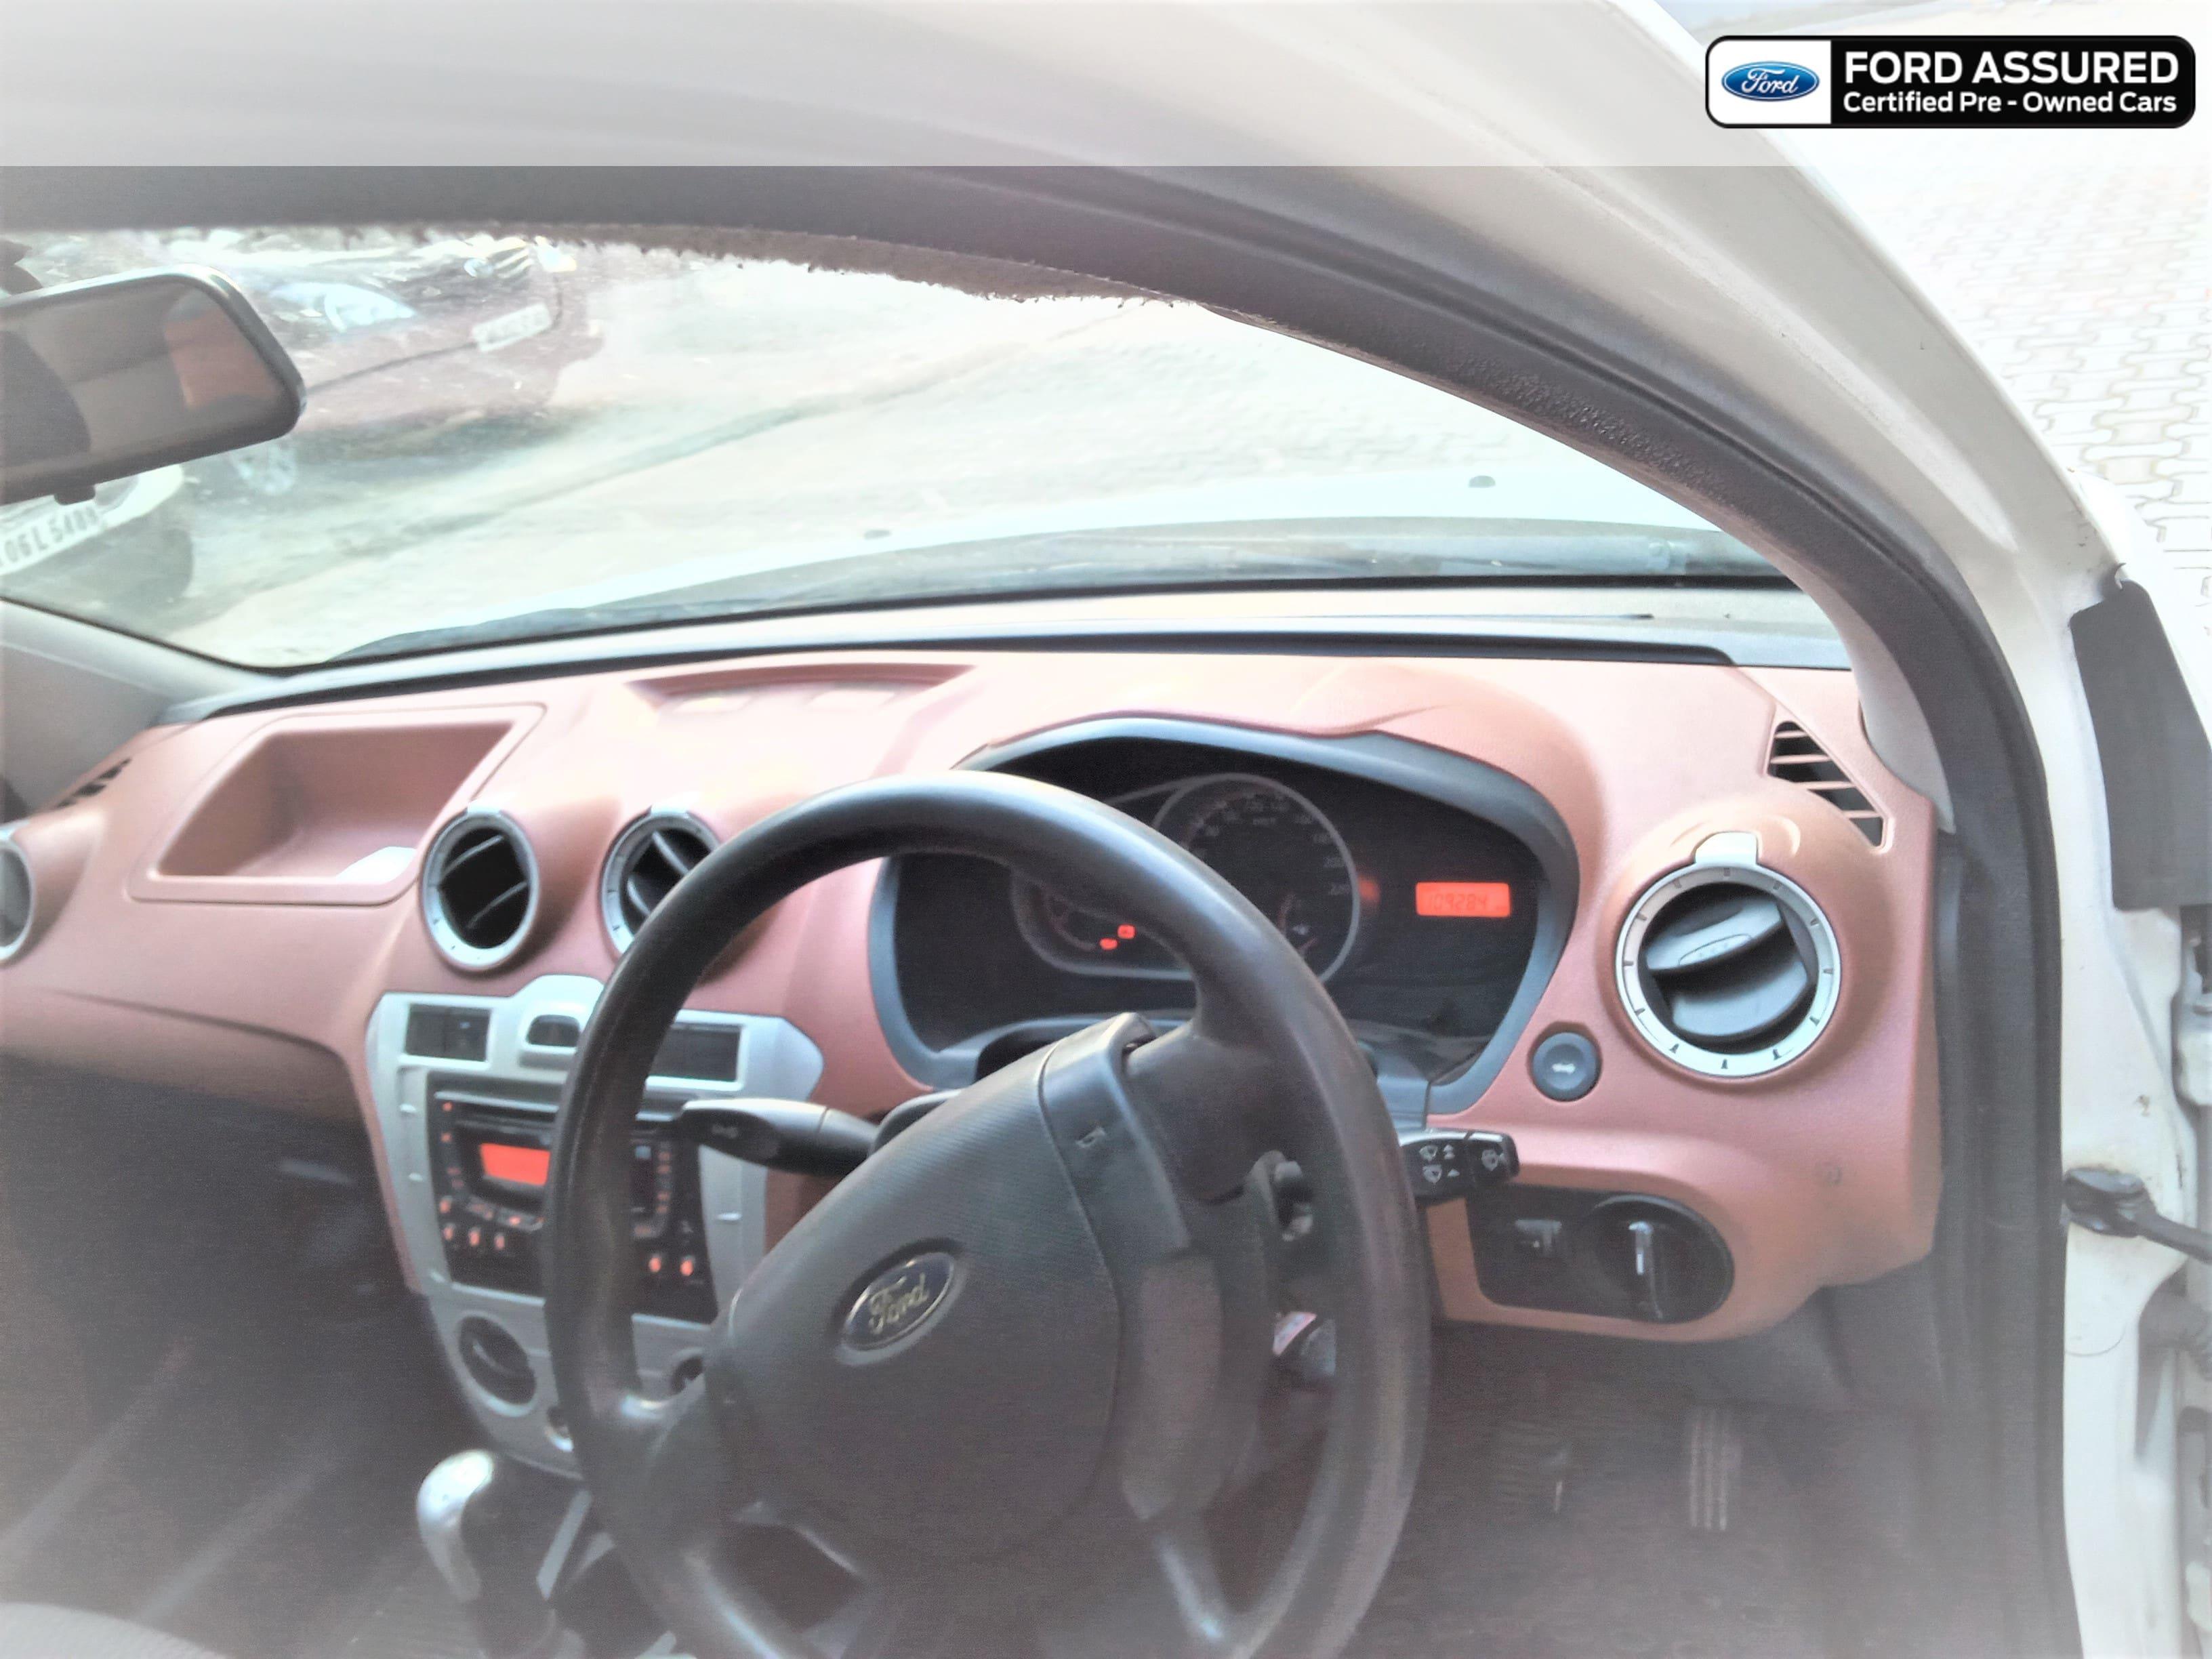 Ford Figo 2010-2012 Diesel ZXI